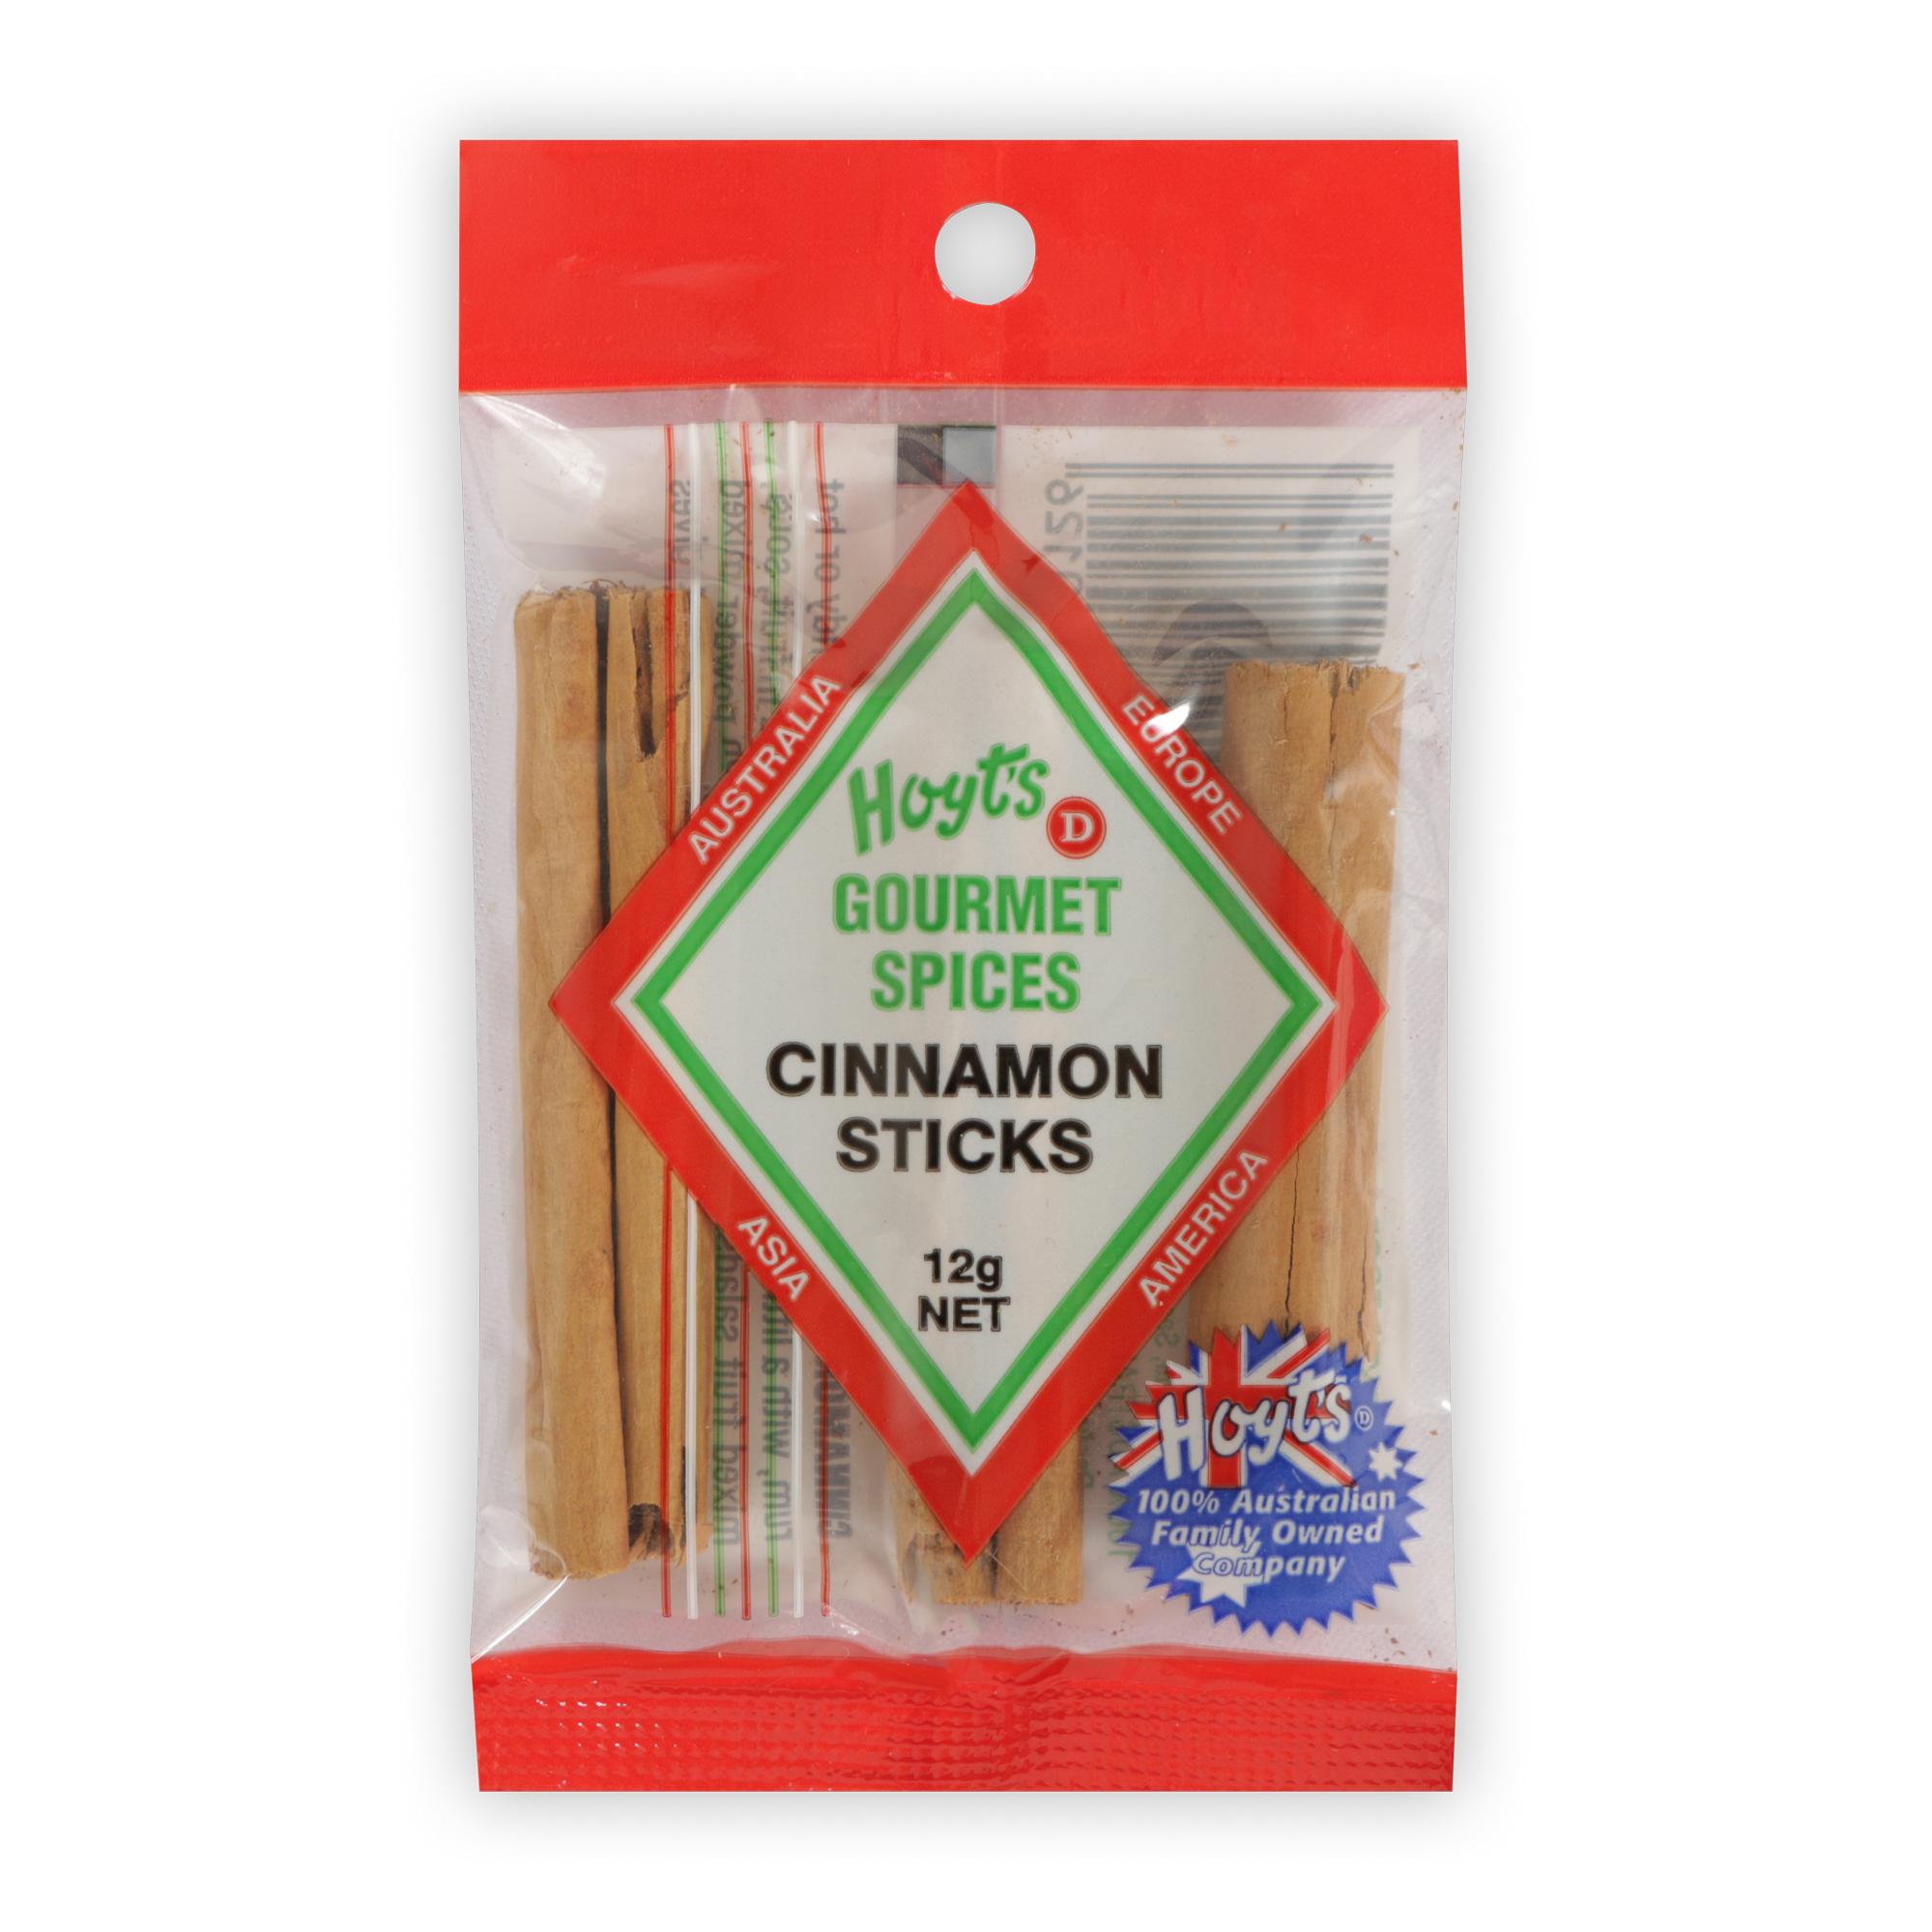 Gourmet Cinnamon Sticks 12g - 9300725010126 1